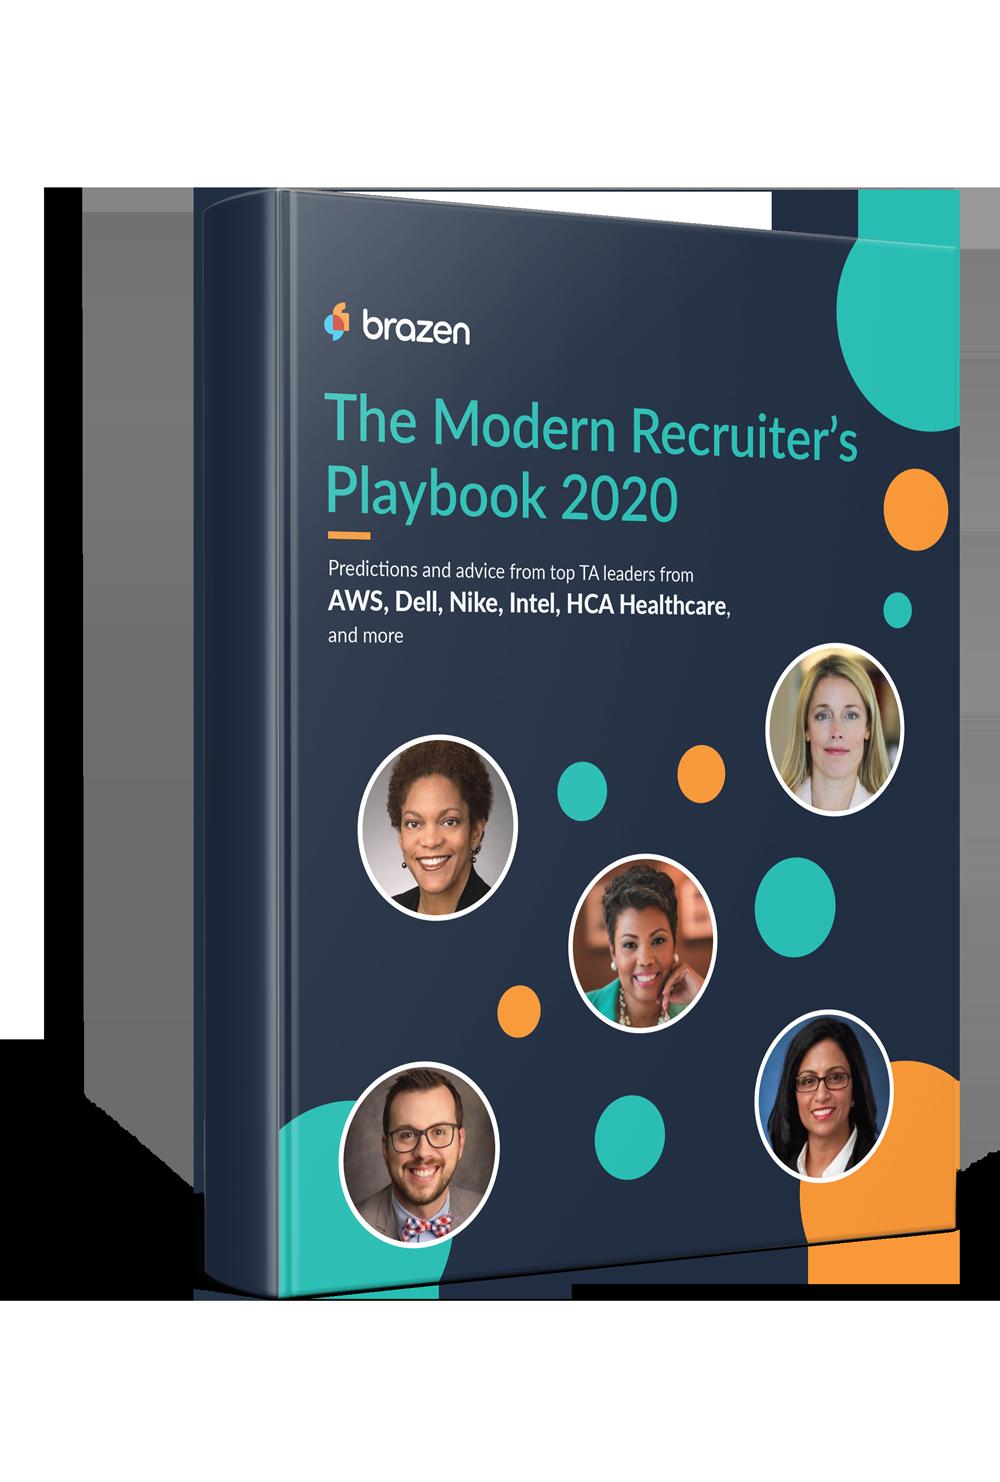 Brazen-P15_The Modern Recruiter's Playbook 2020_3D book mockup